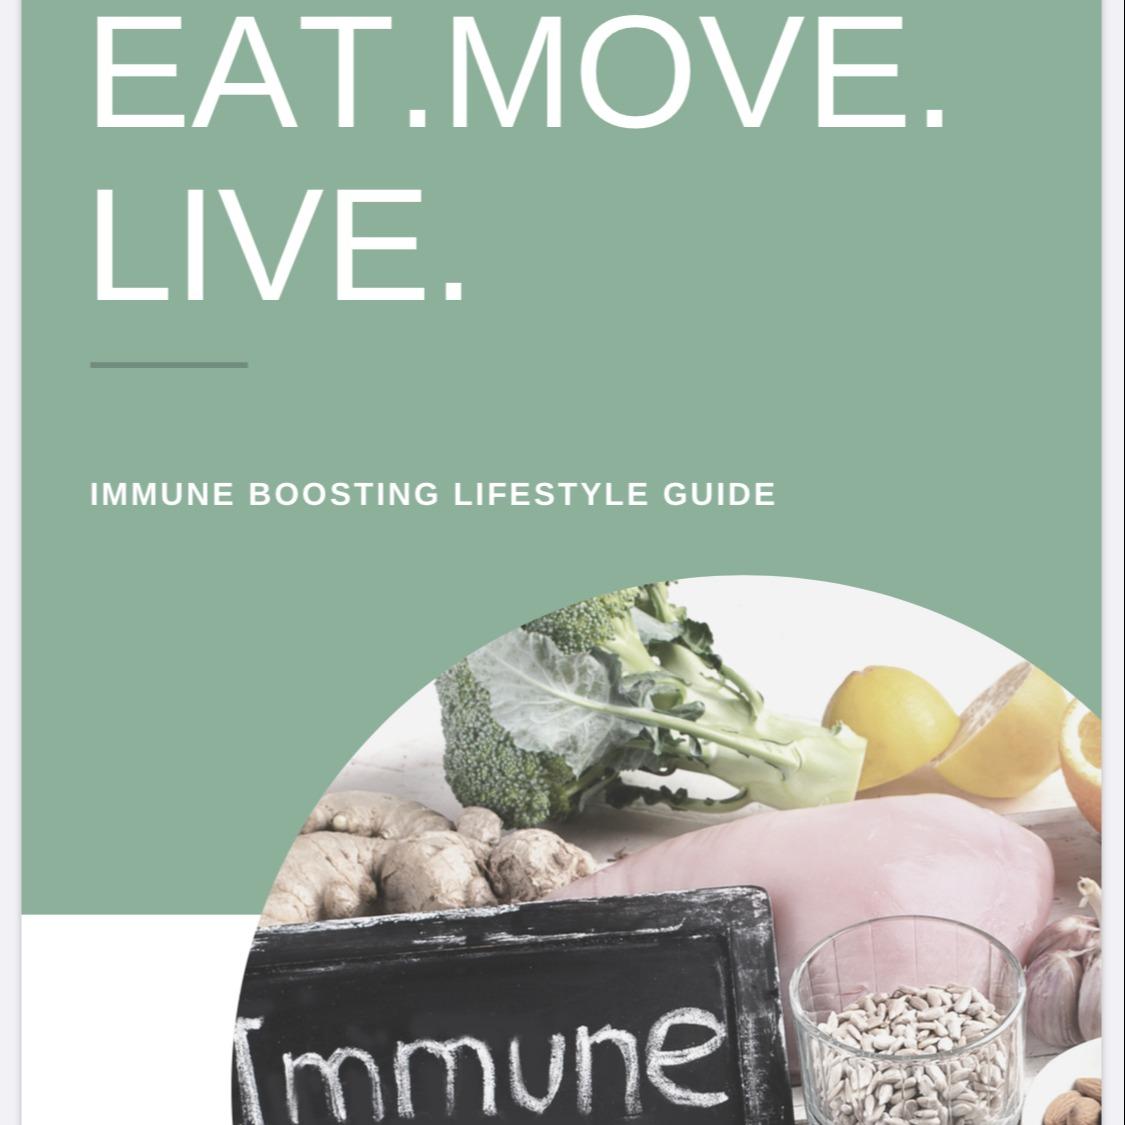 Immune Boosting Guide